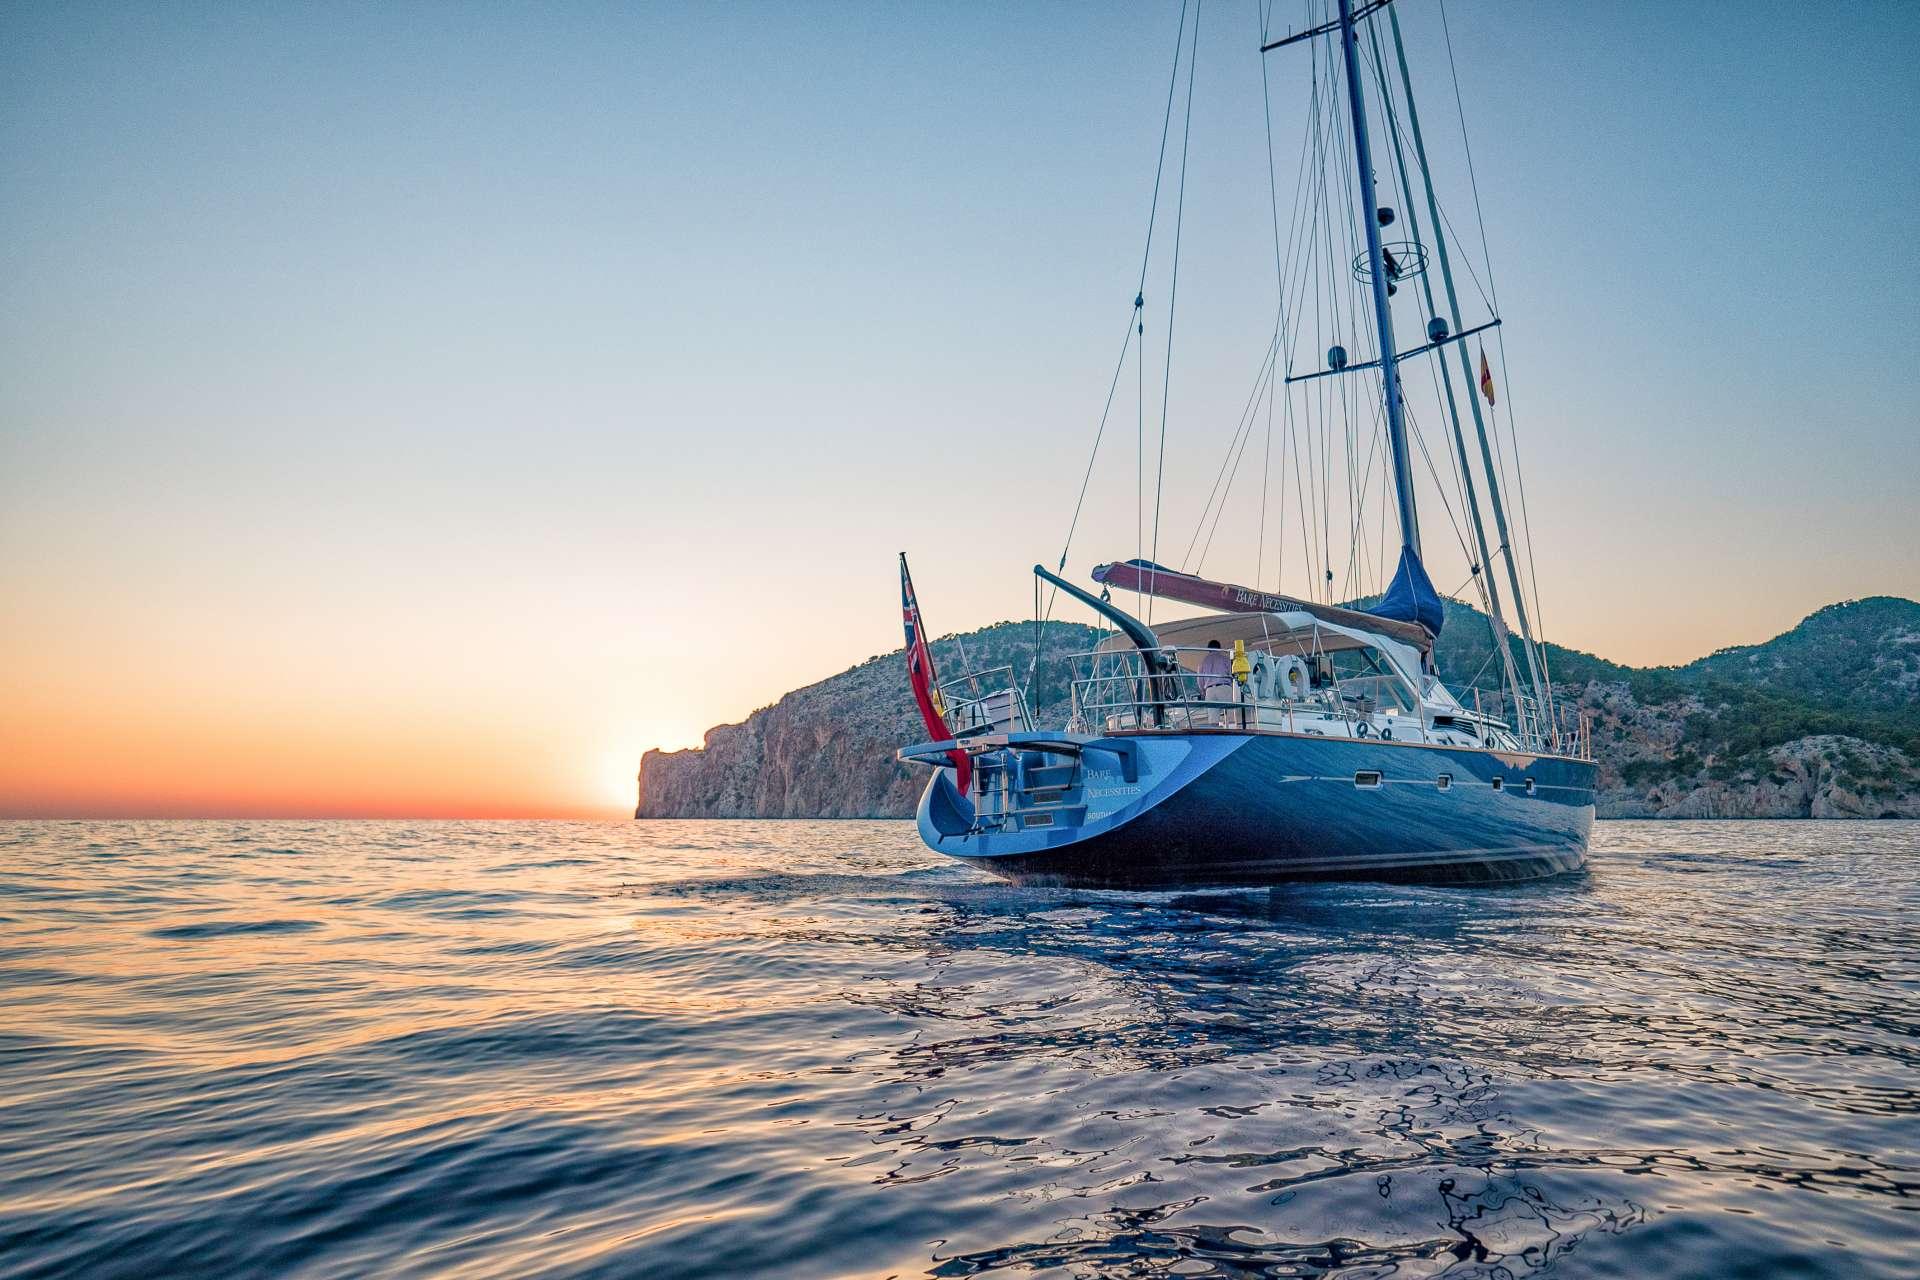 Main image of BARE NECESSITIES yacht